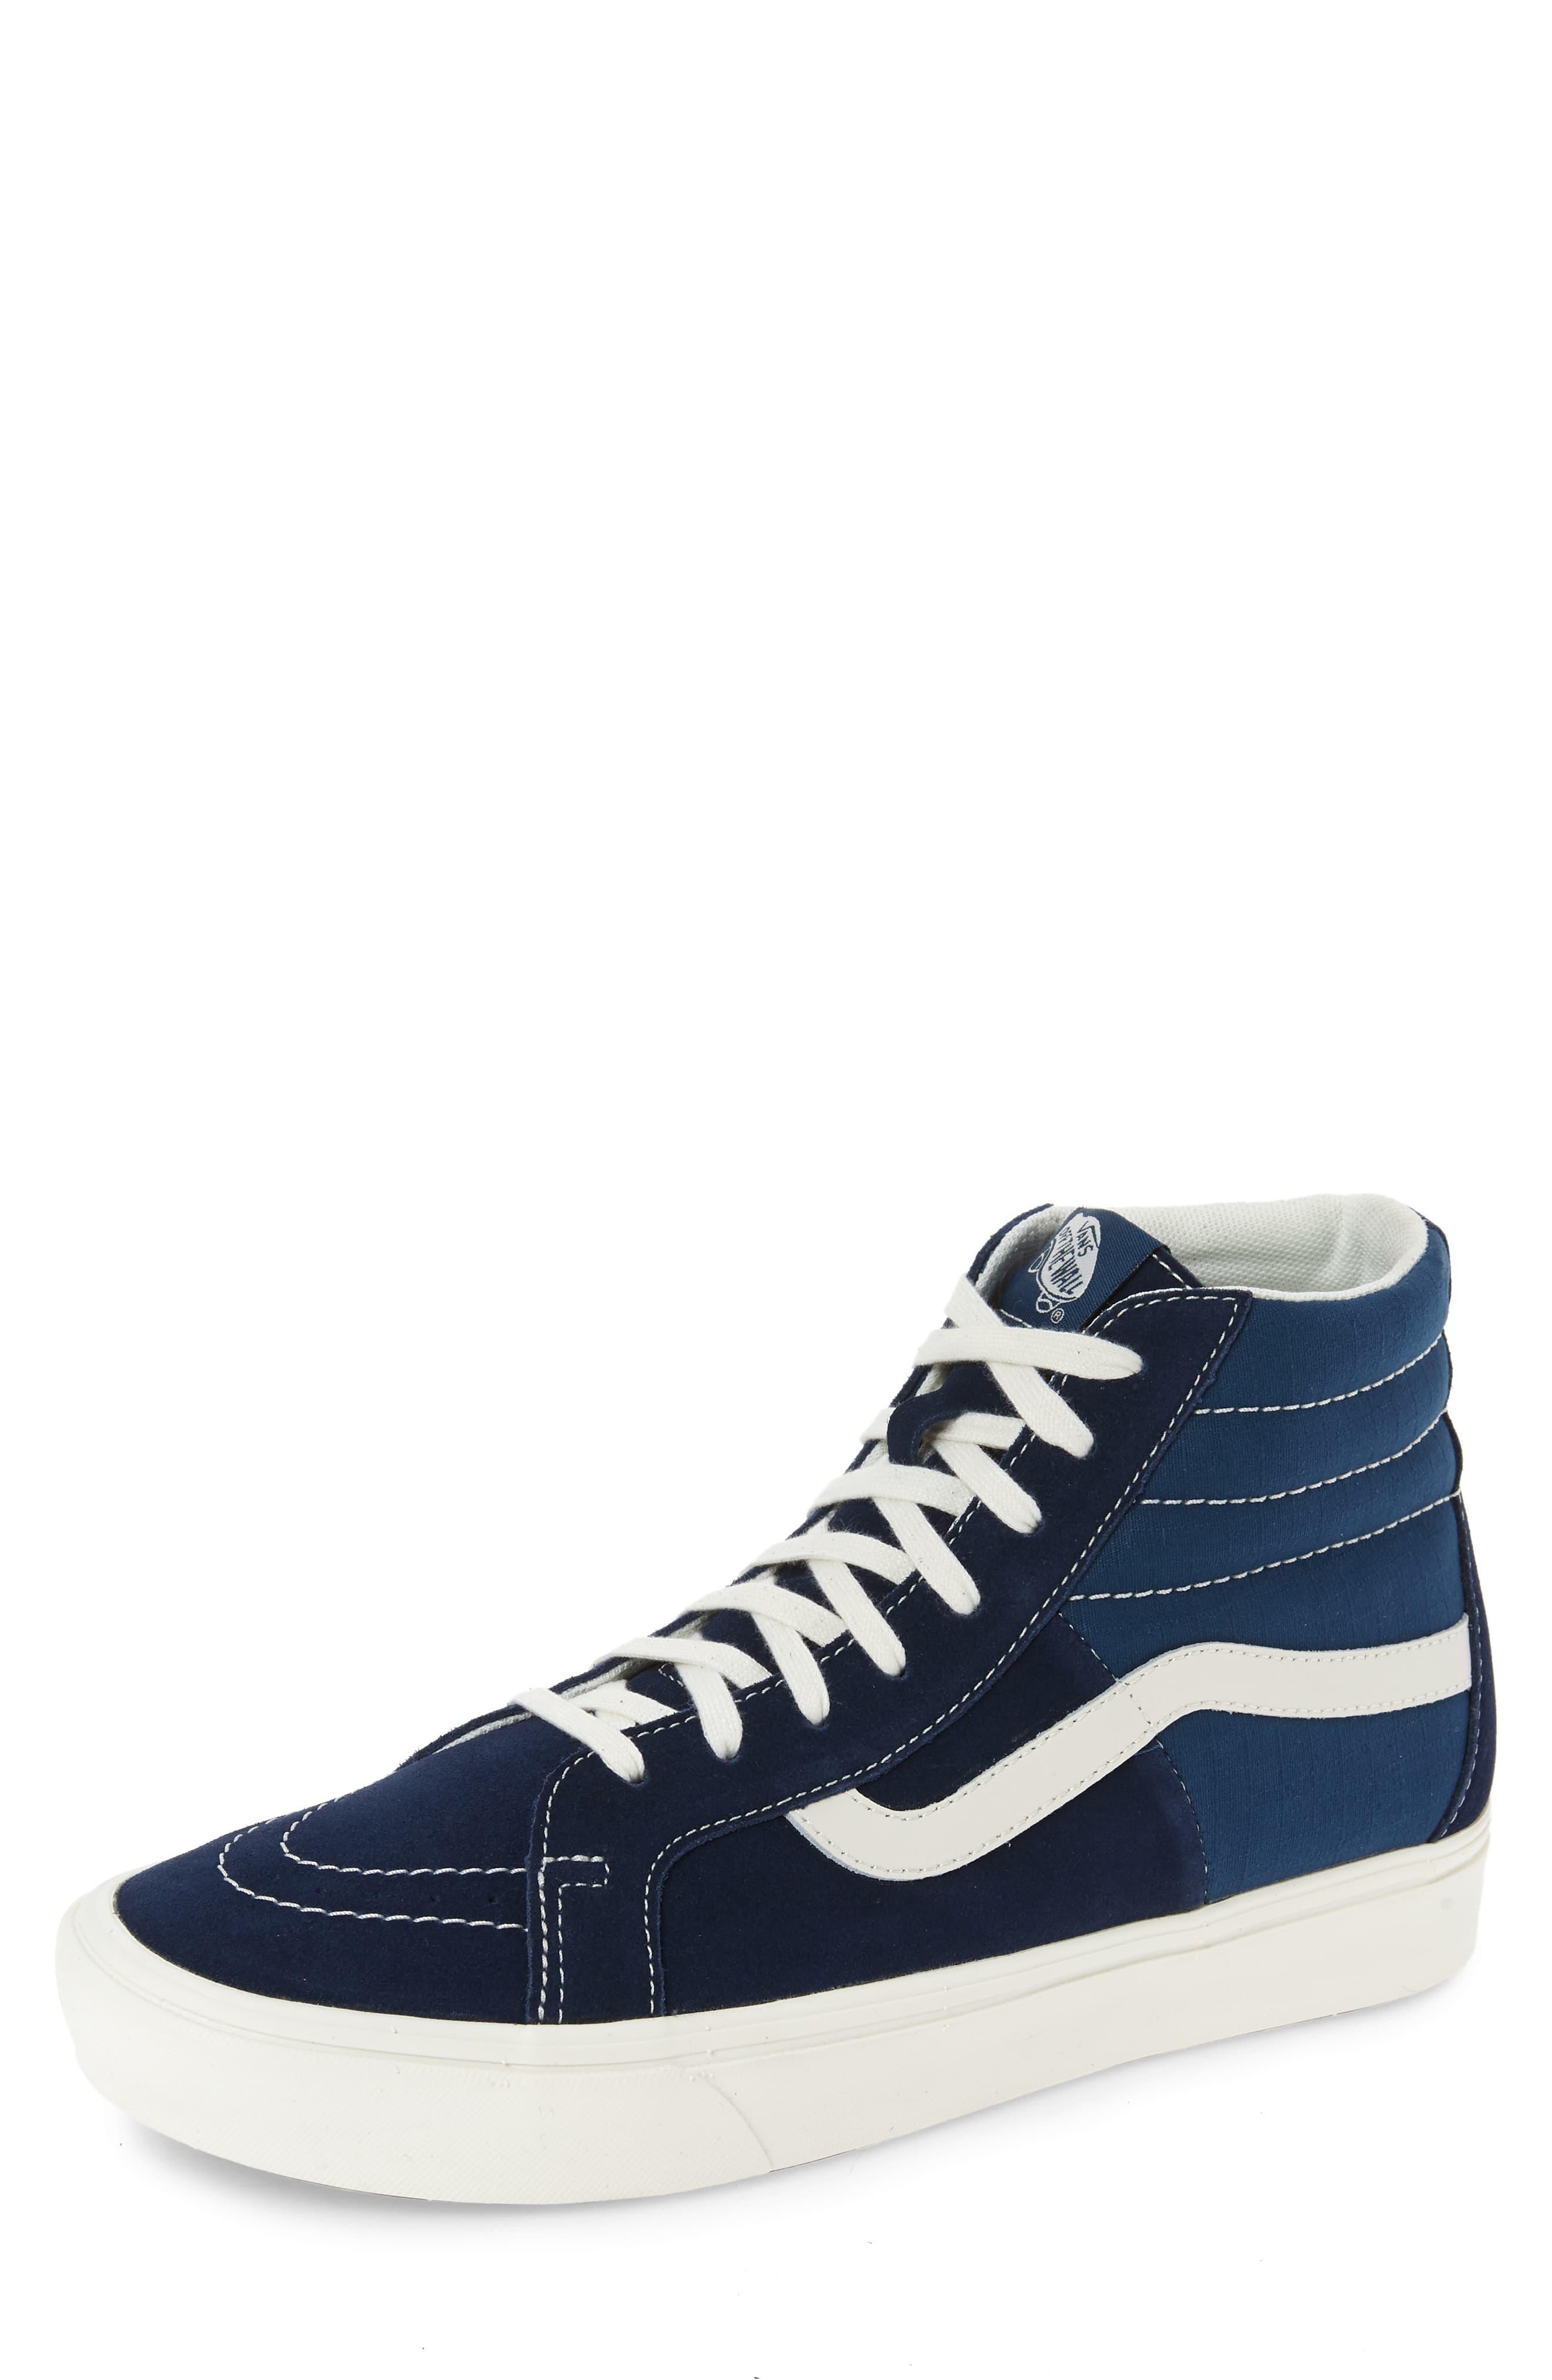 Vans Comfycush Sk8 Hi Split Sneaker